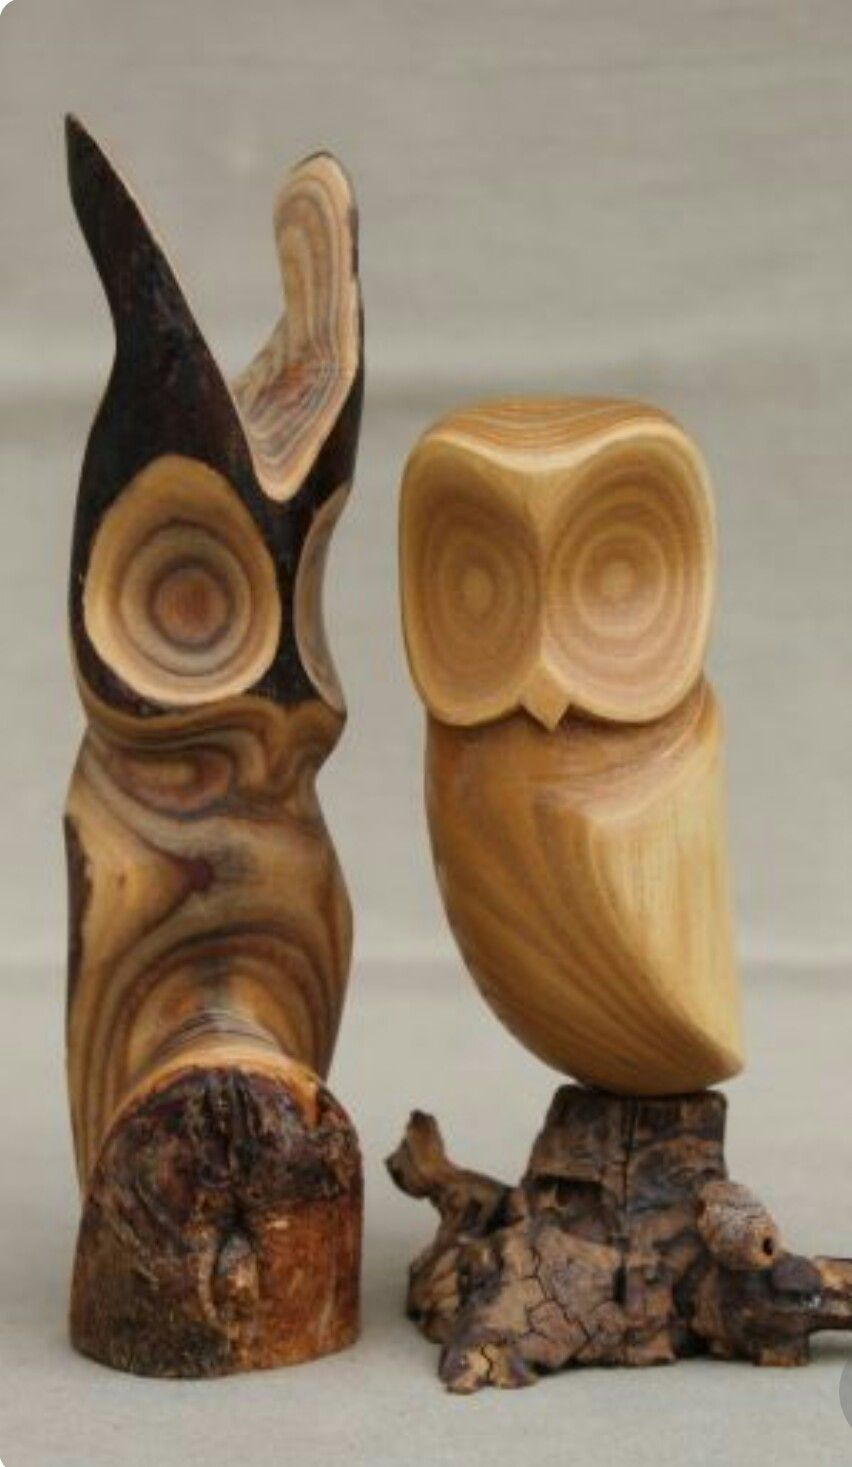 Freya wedding horn , matched pair pic6 by Bonecarverpm | Koponya, Faragás, Agancsok